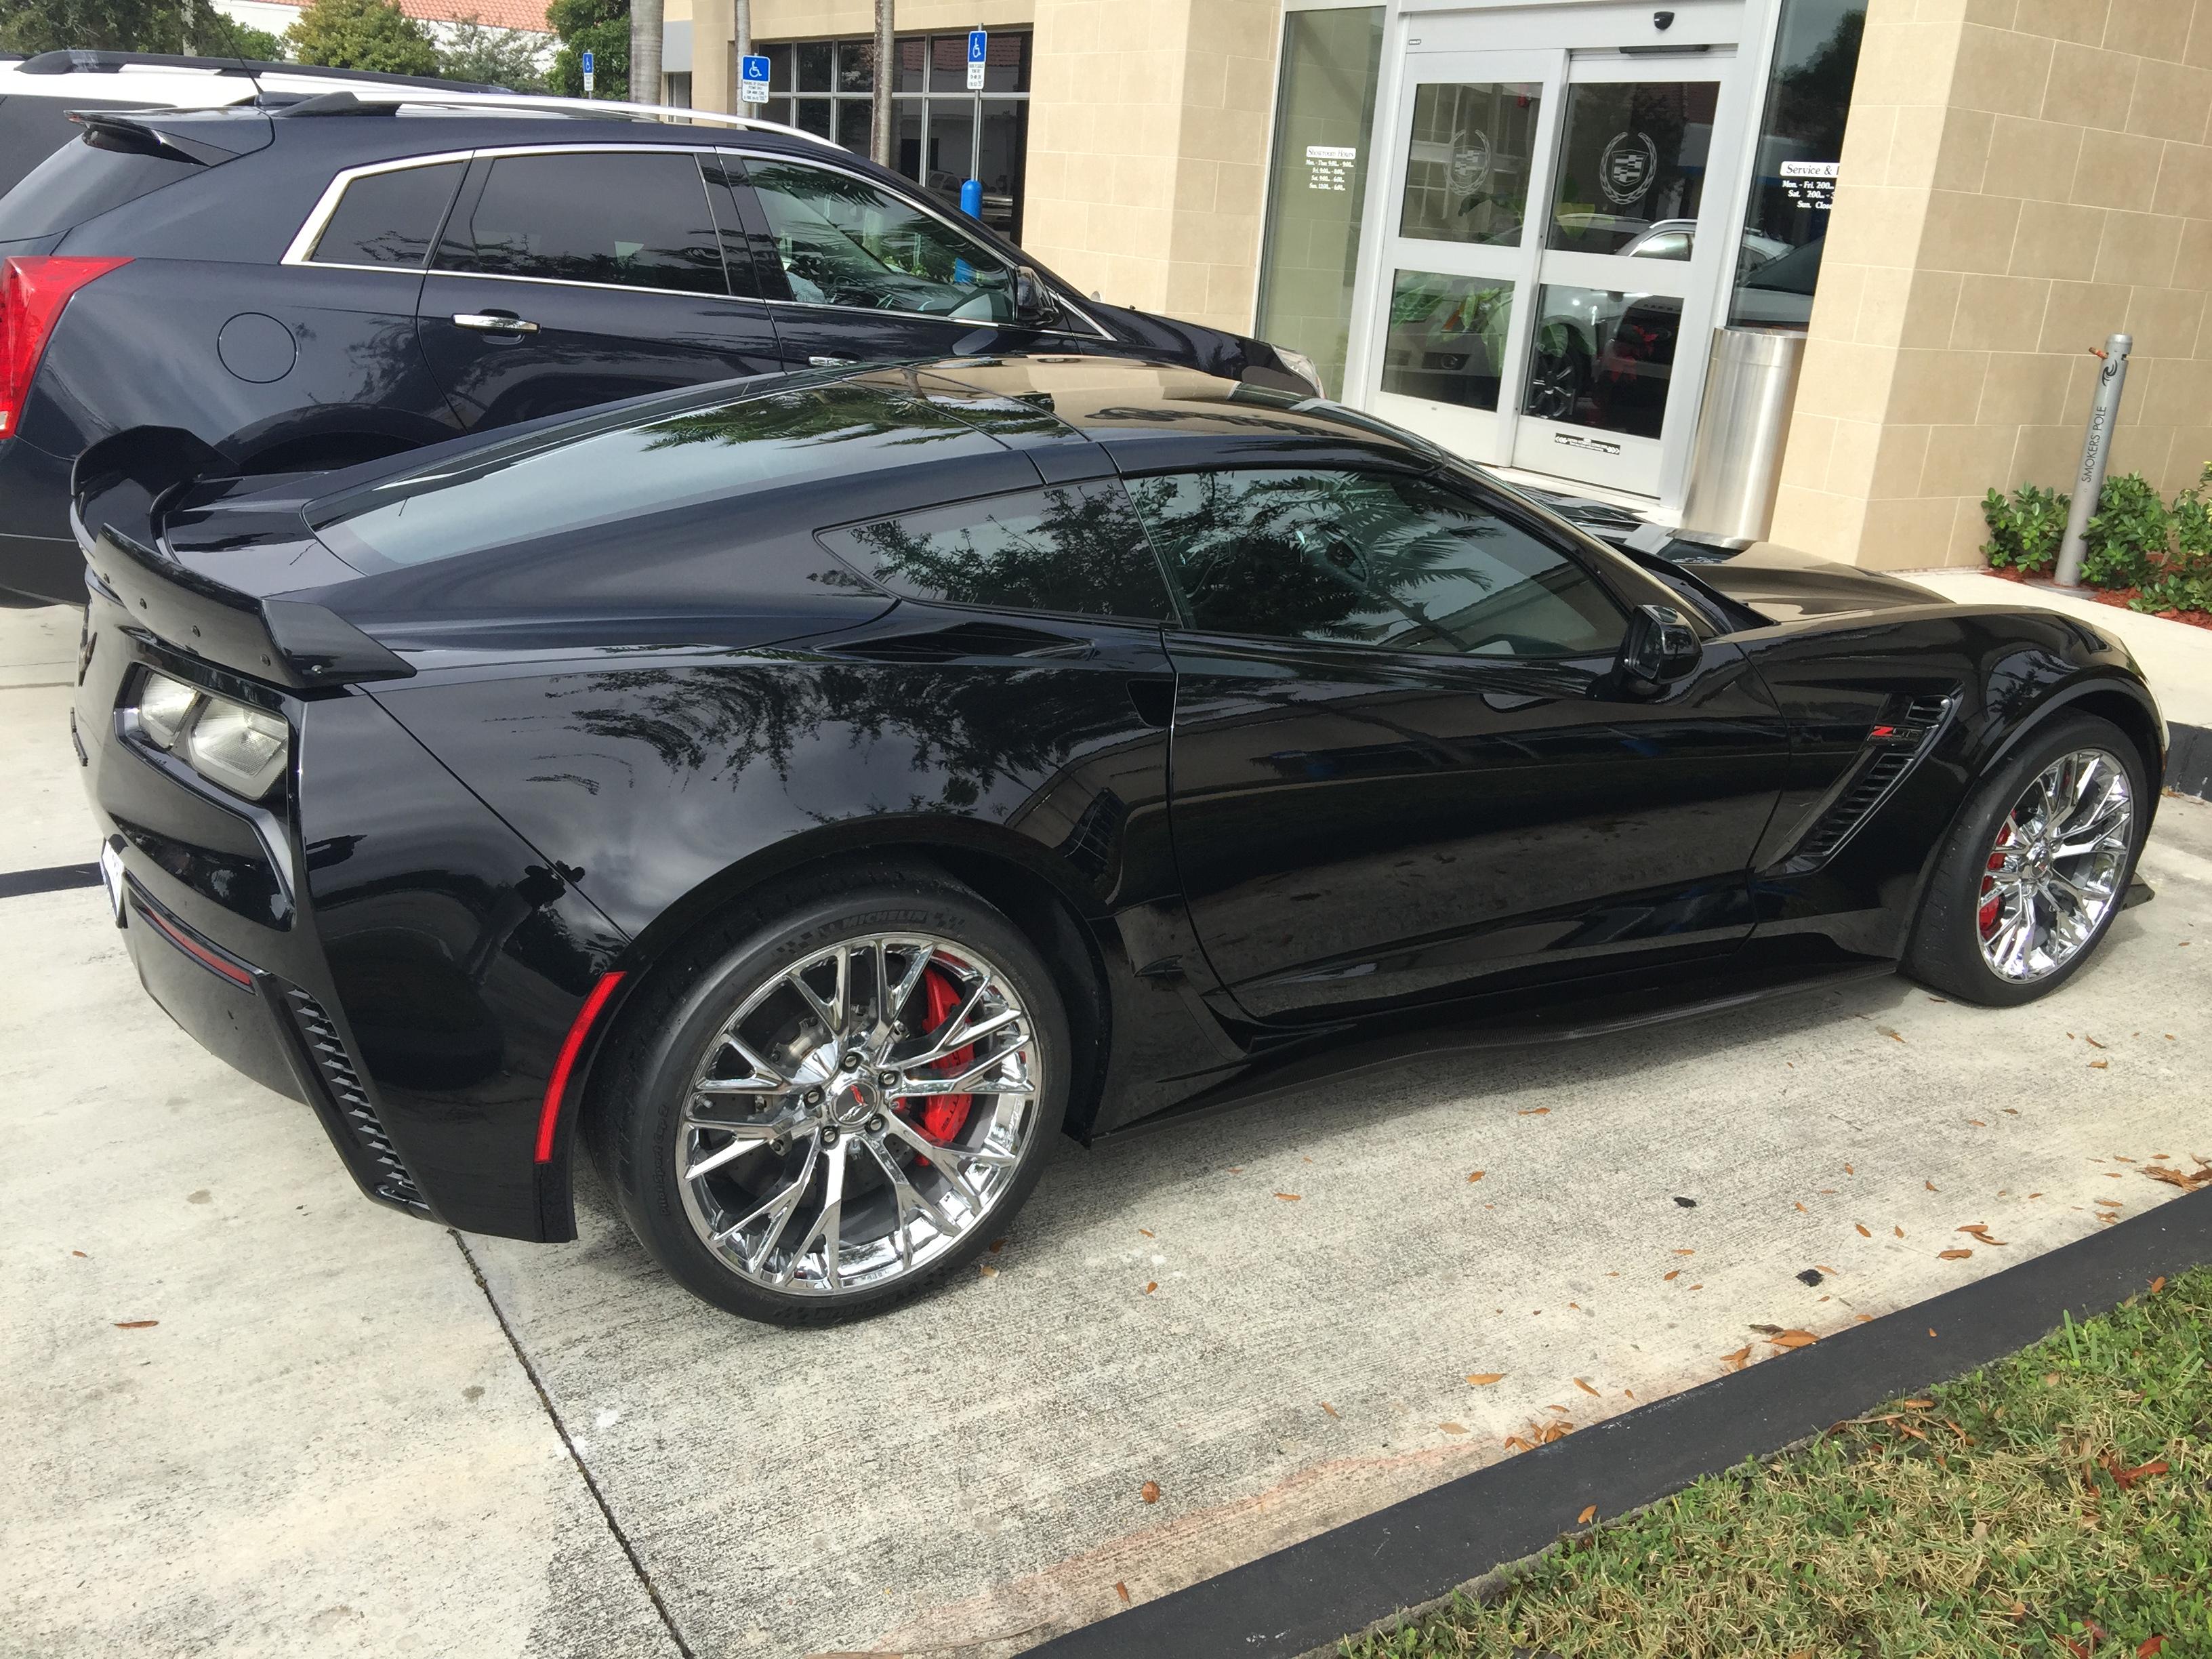 2015 z06 black related keywords suggestions 2015 z06 black long - Corvette 2015 Z06 Black